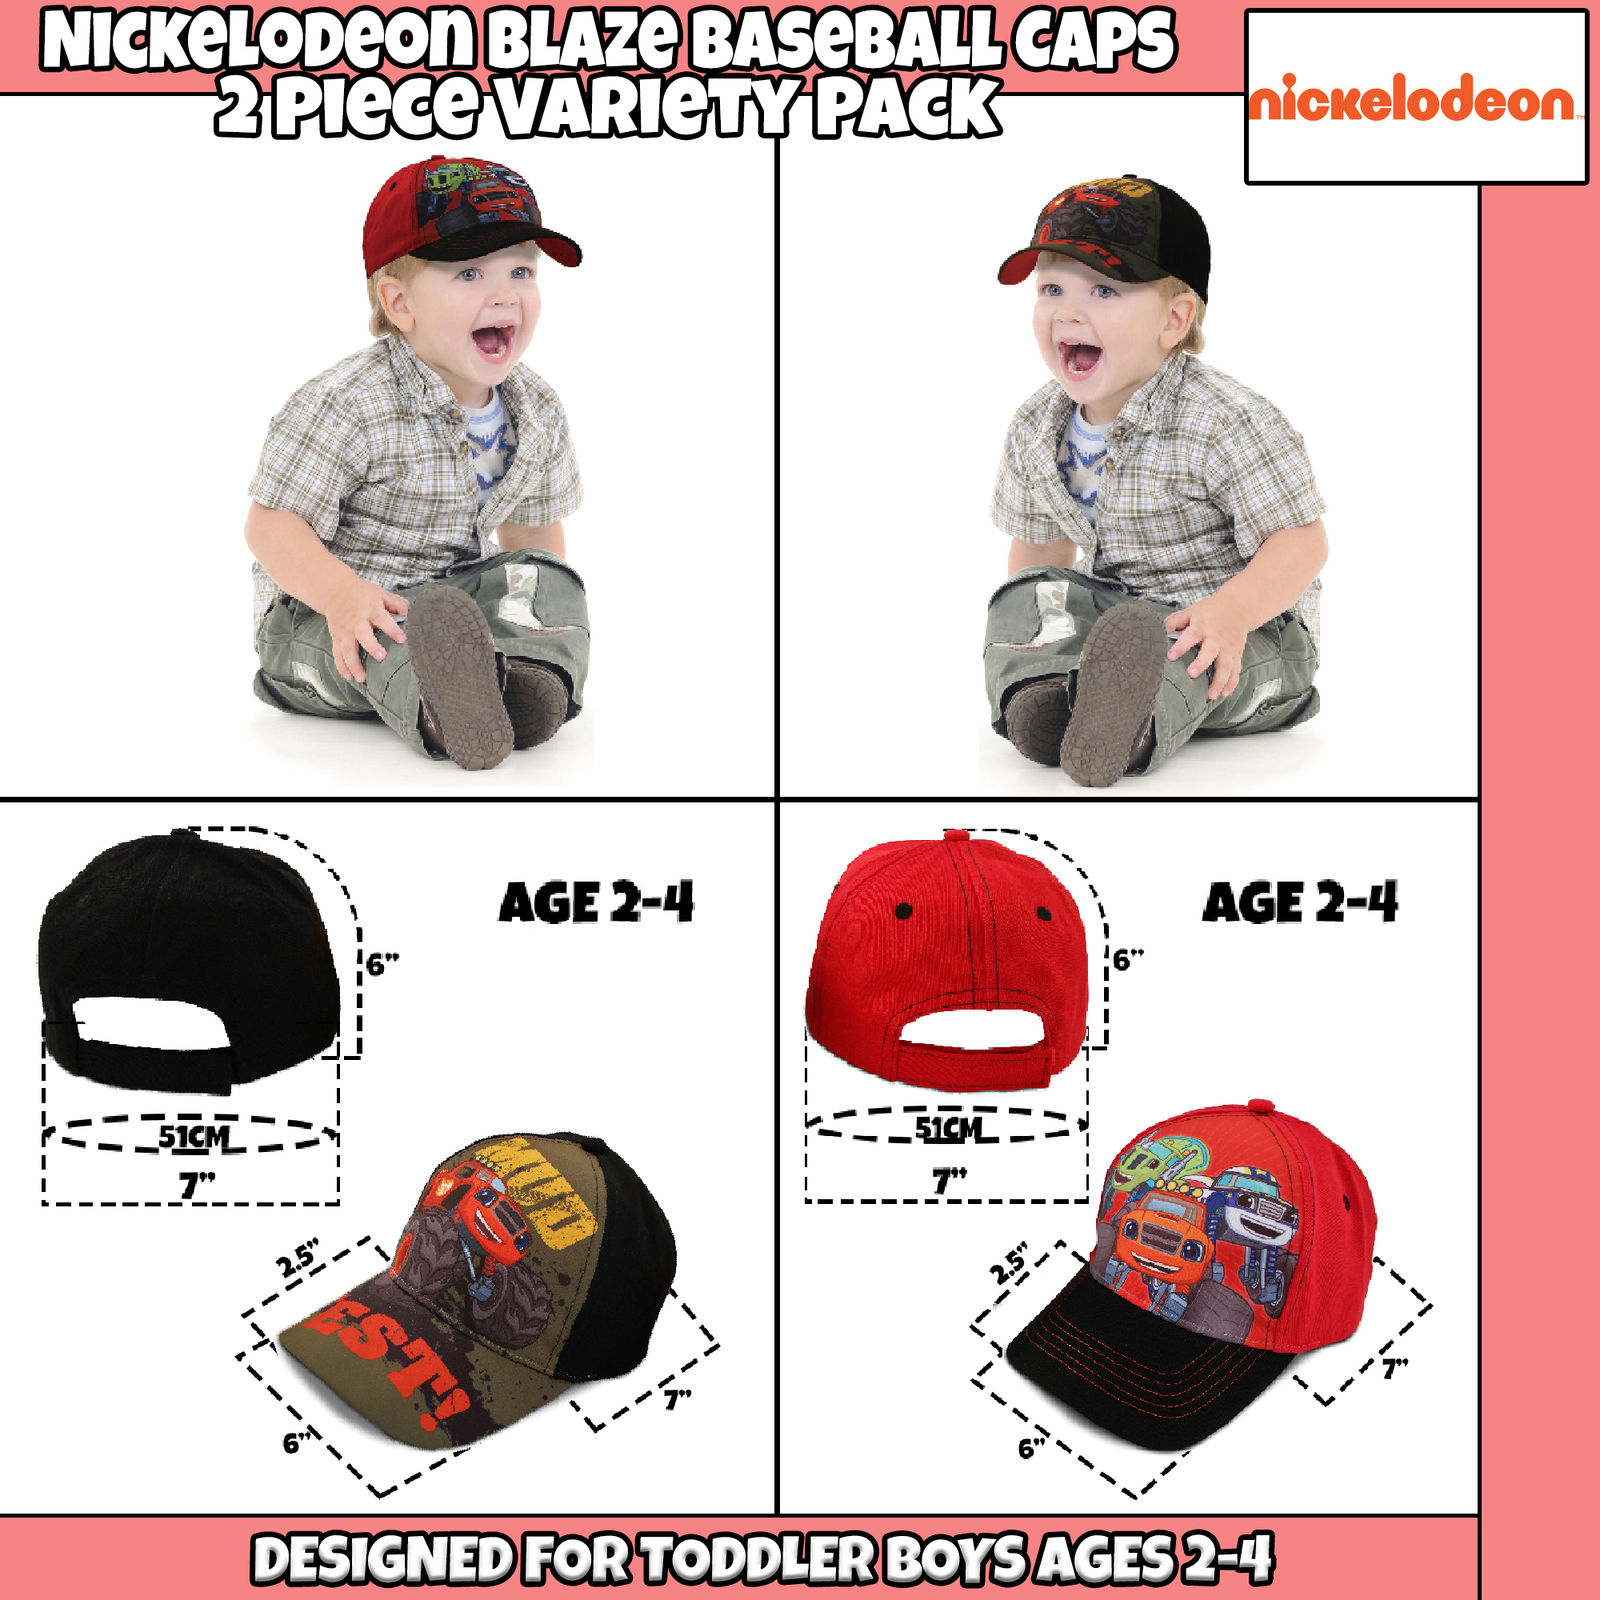 sale retailer 902ae d0a41 Nickelodeon - Nickelodeon Toddler Boys Blaze Character Cotton Baseball Cap,  2 Piece Design Set, Age 2-4 - Walmart.com